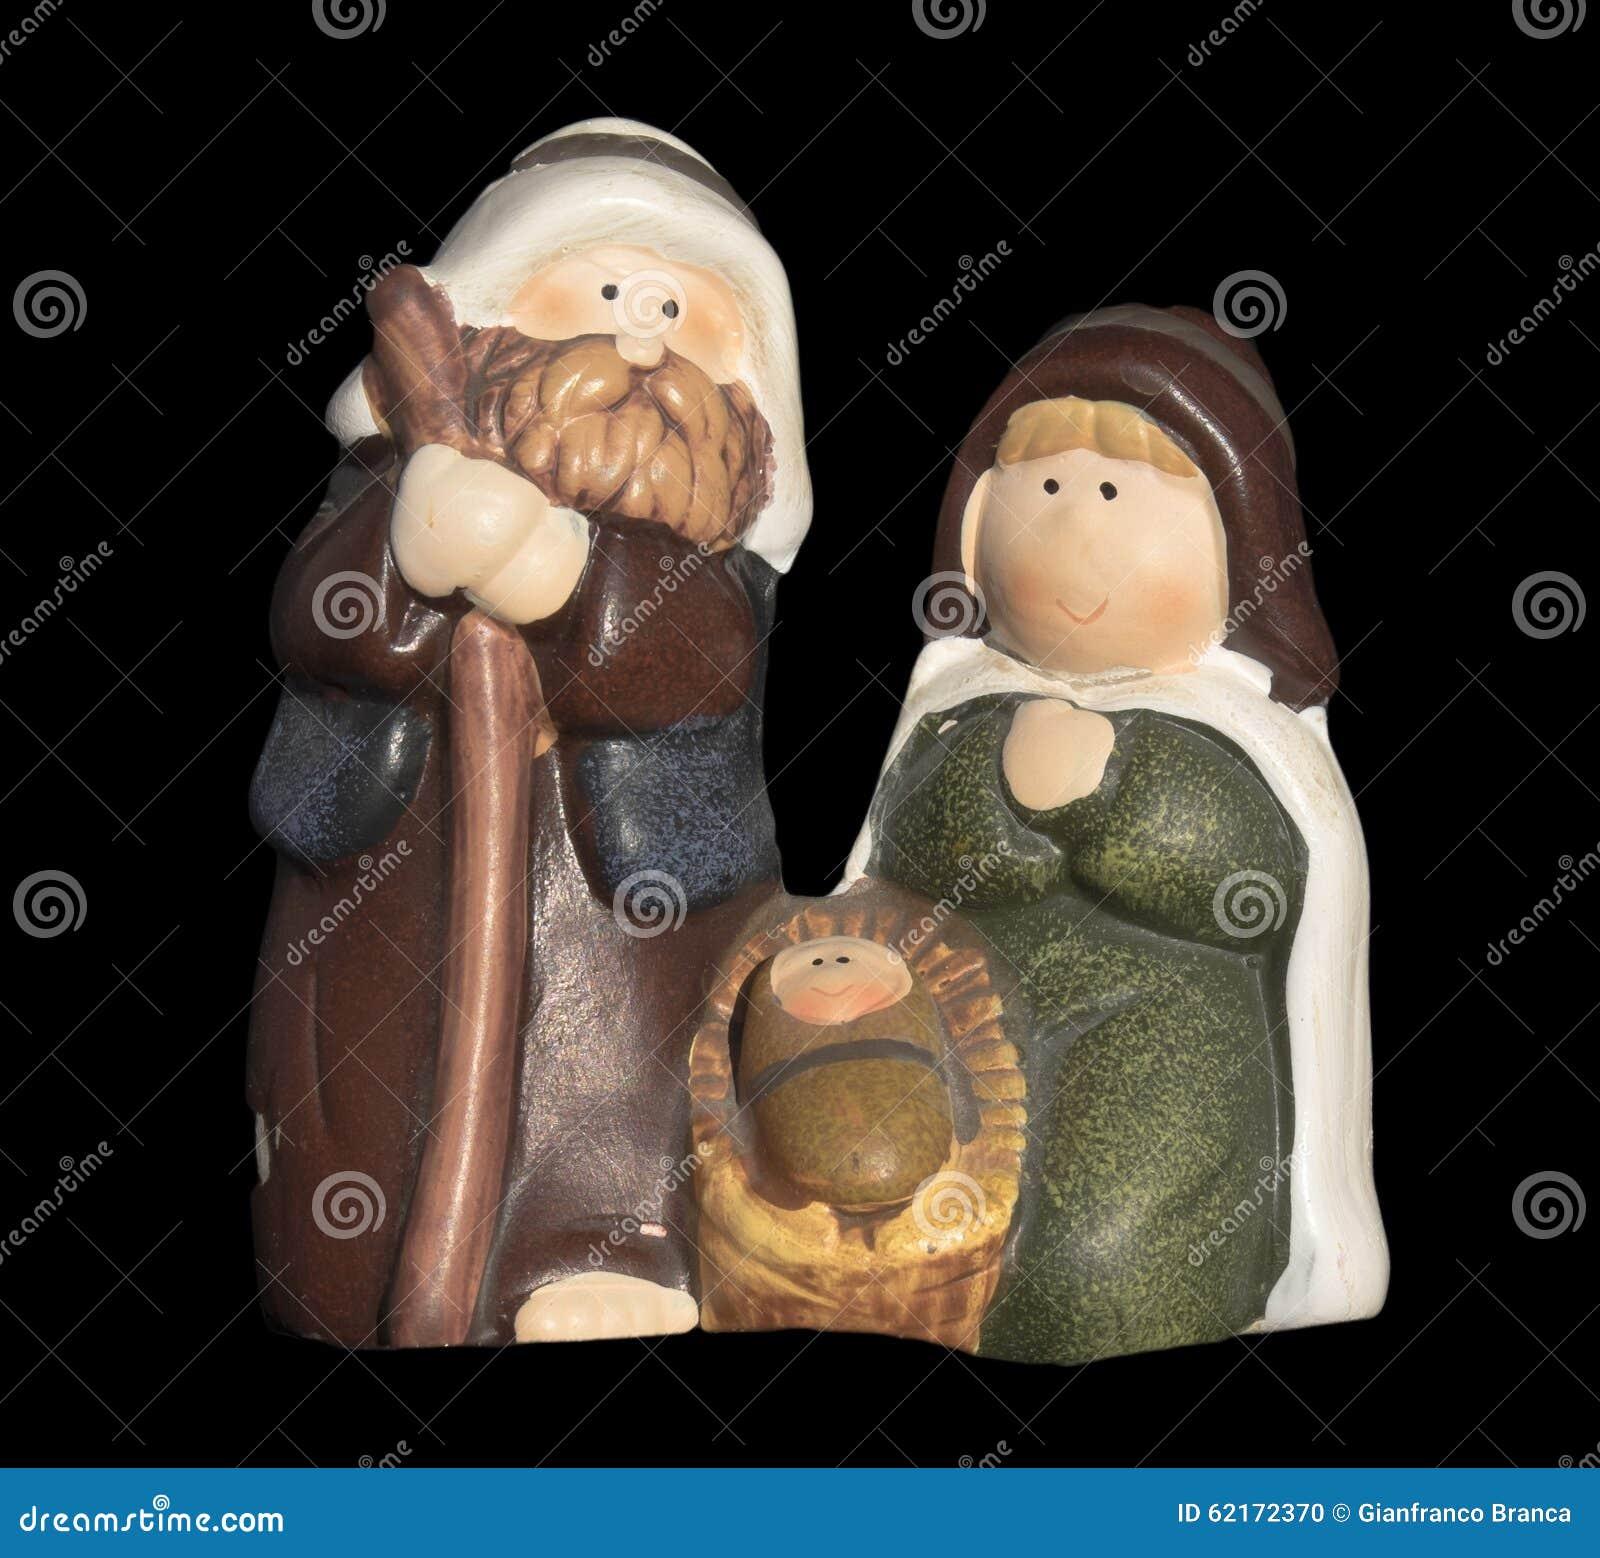 Ceramic Nativity Christmas Ornament Stock Photo - Image ...